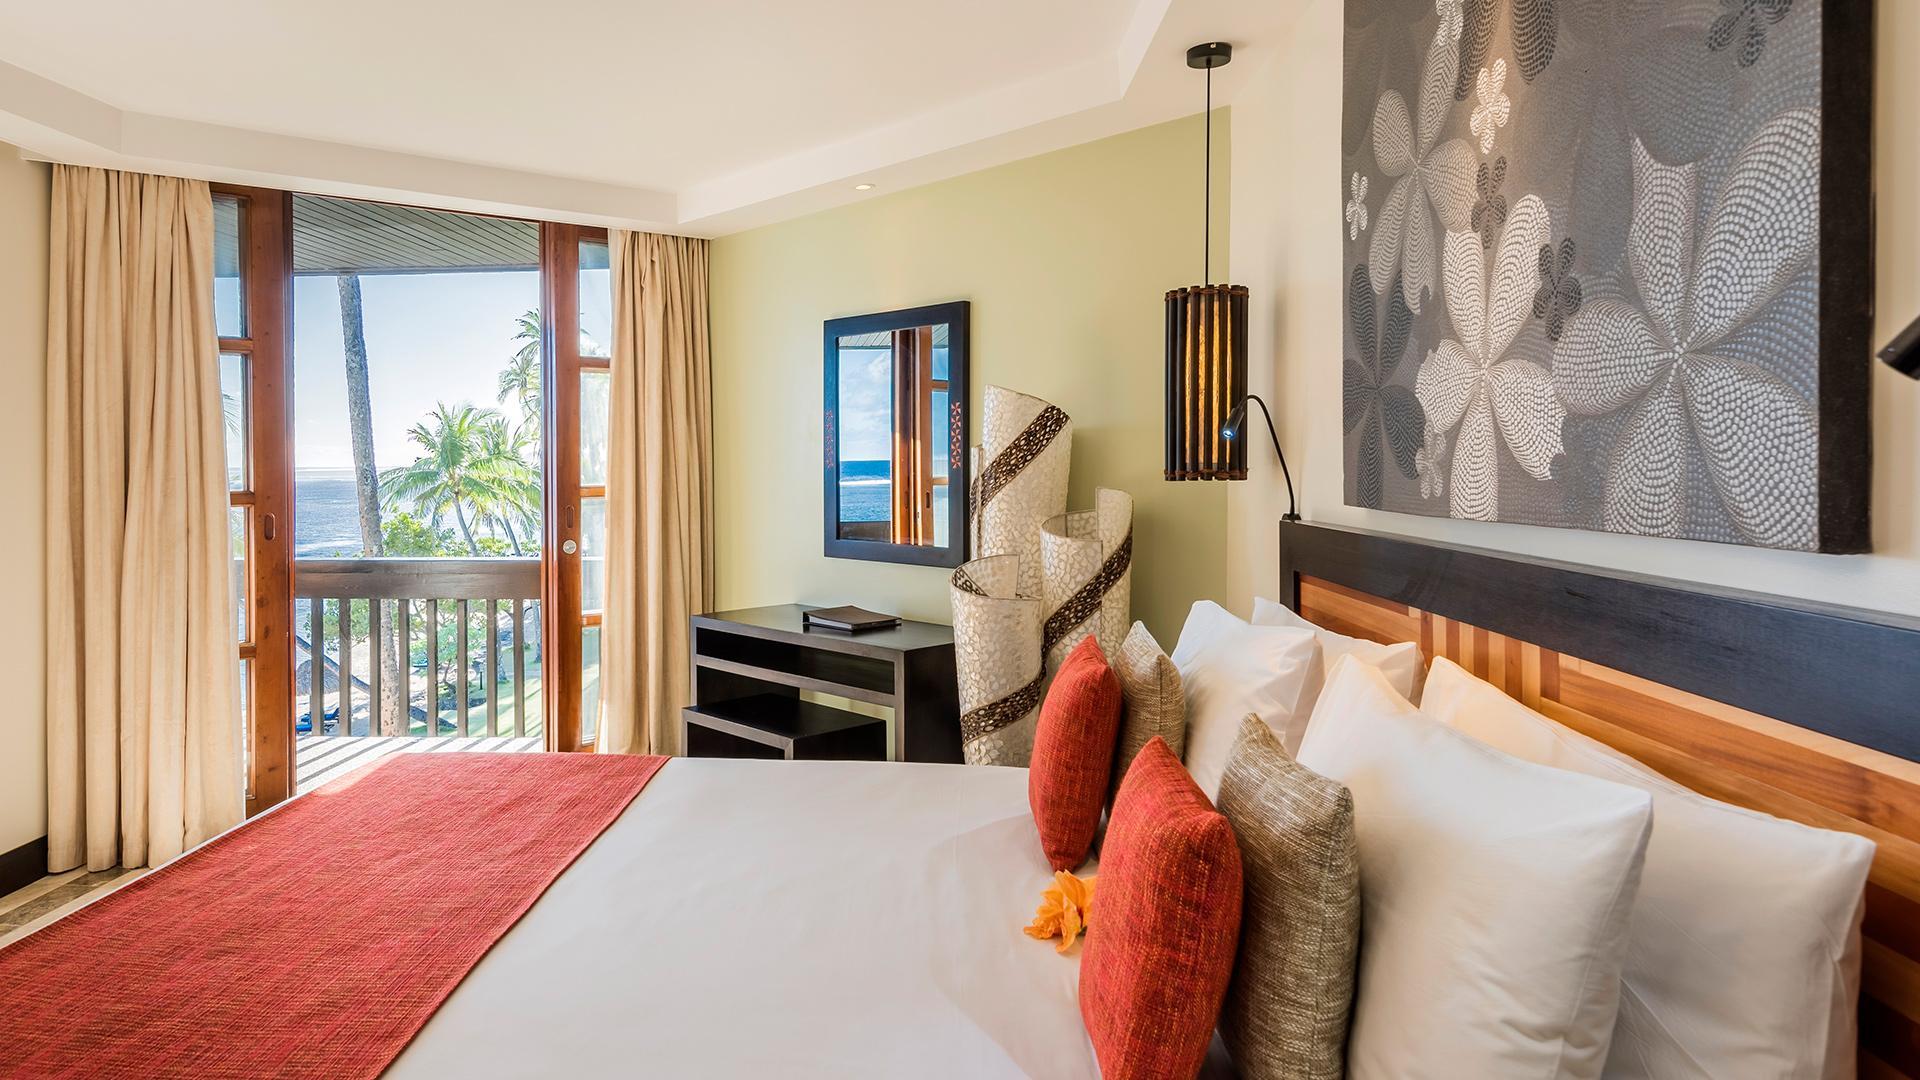 Warwick Suite image 1 at Warwick Fiji by Nadroga-Navosa, Western Division, Fiji